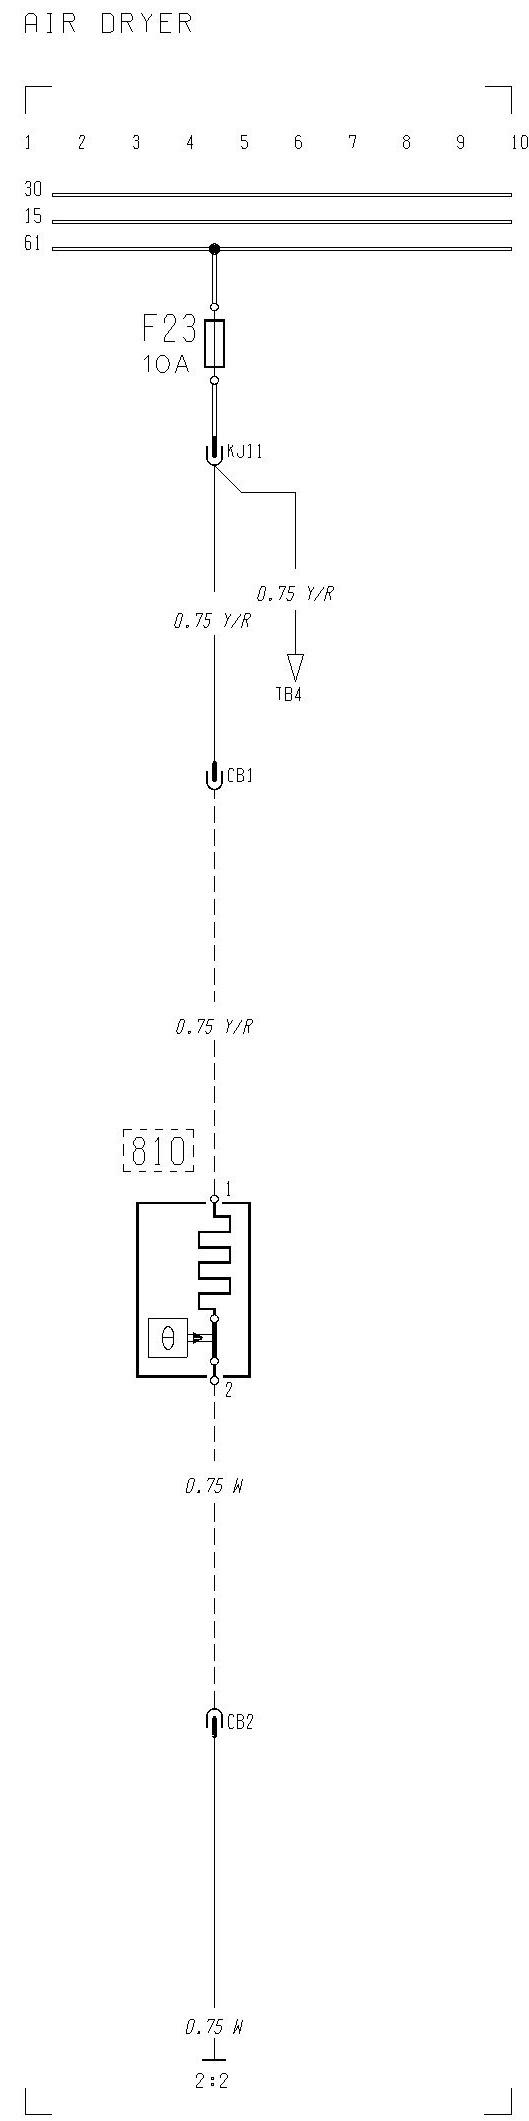 volvo f12 f16 wiring diagram air dryer carknowledge rh carknowledge info 4 Prong Dryer Wiring Diagram Roper Dryer Wiring Diagram